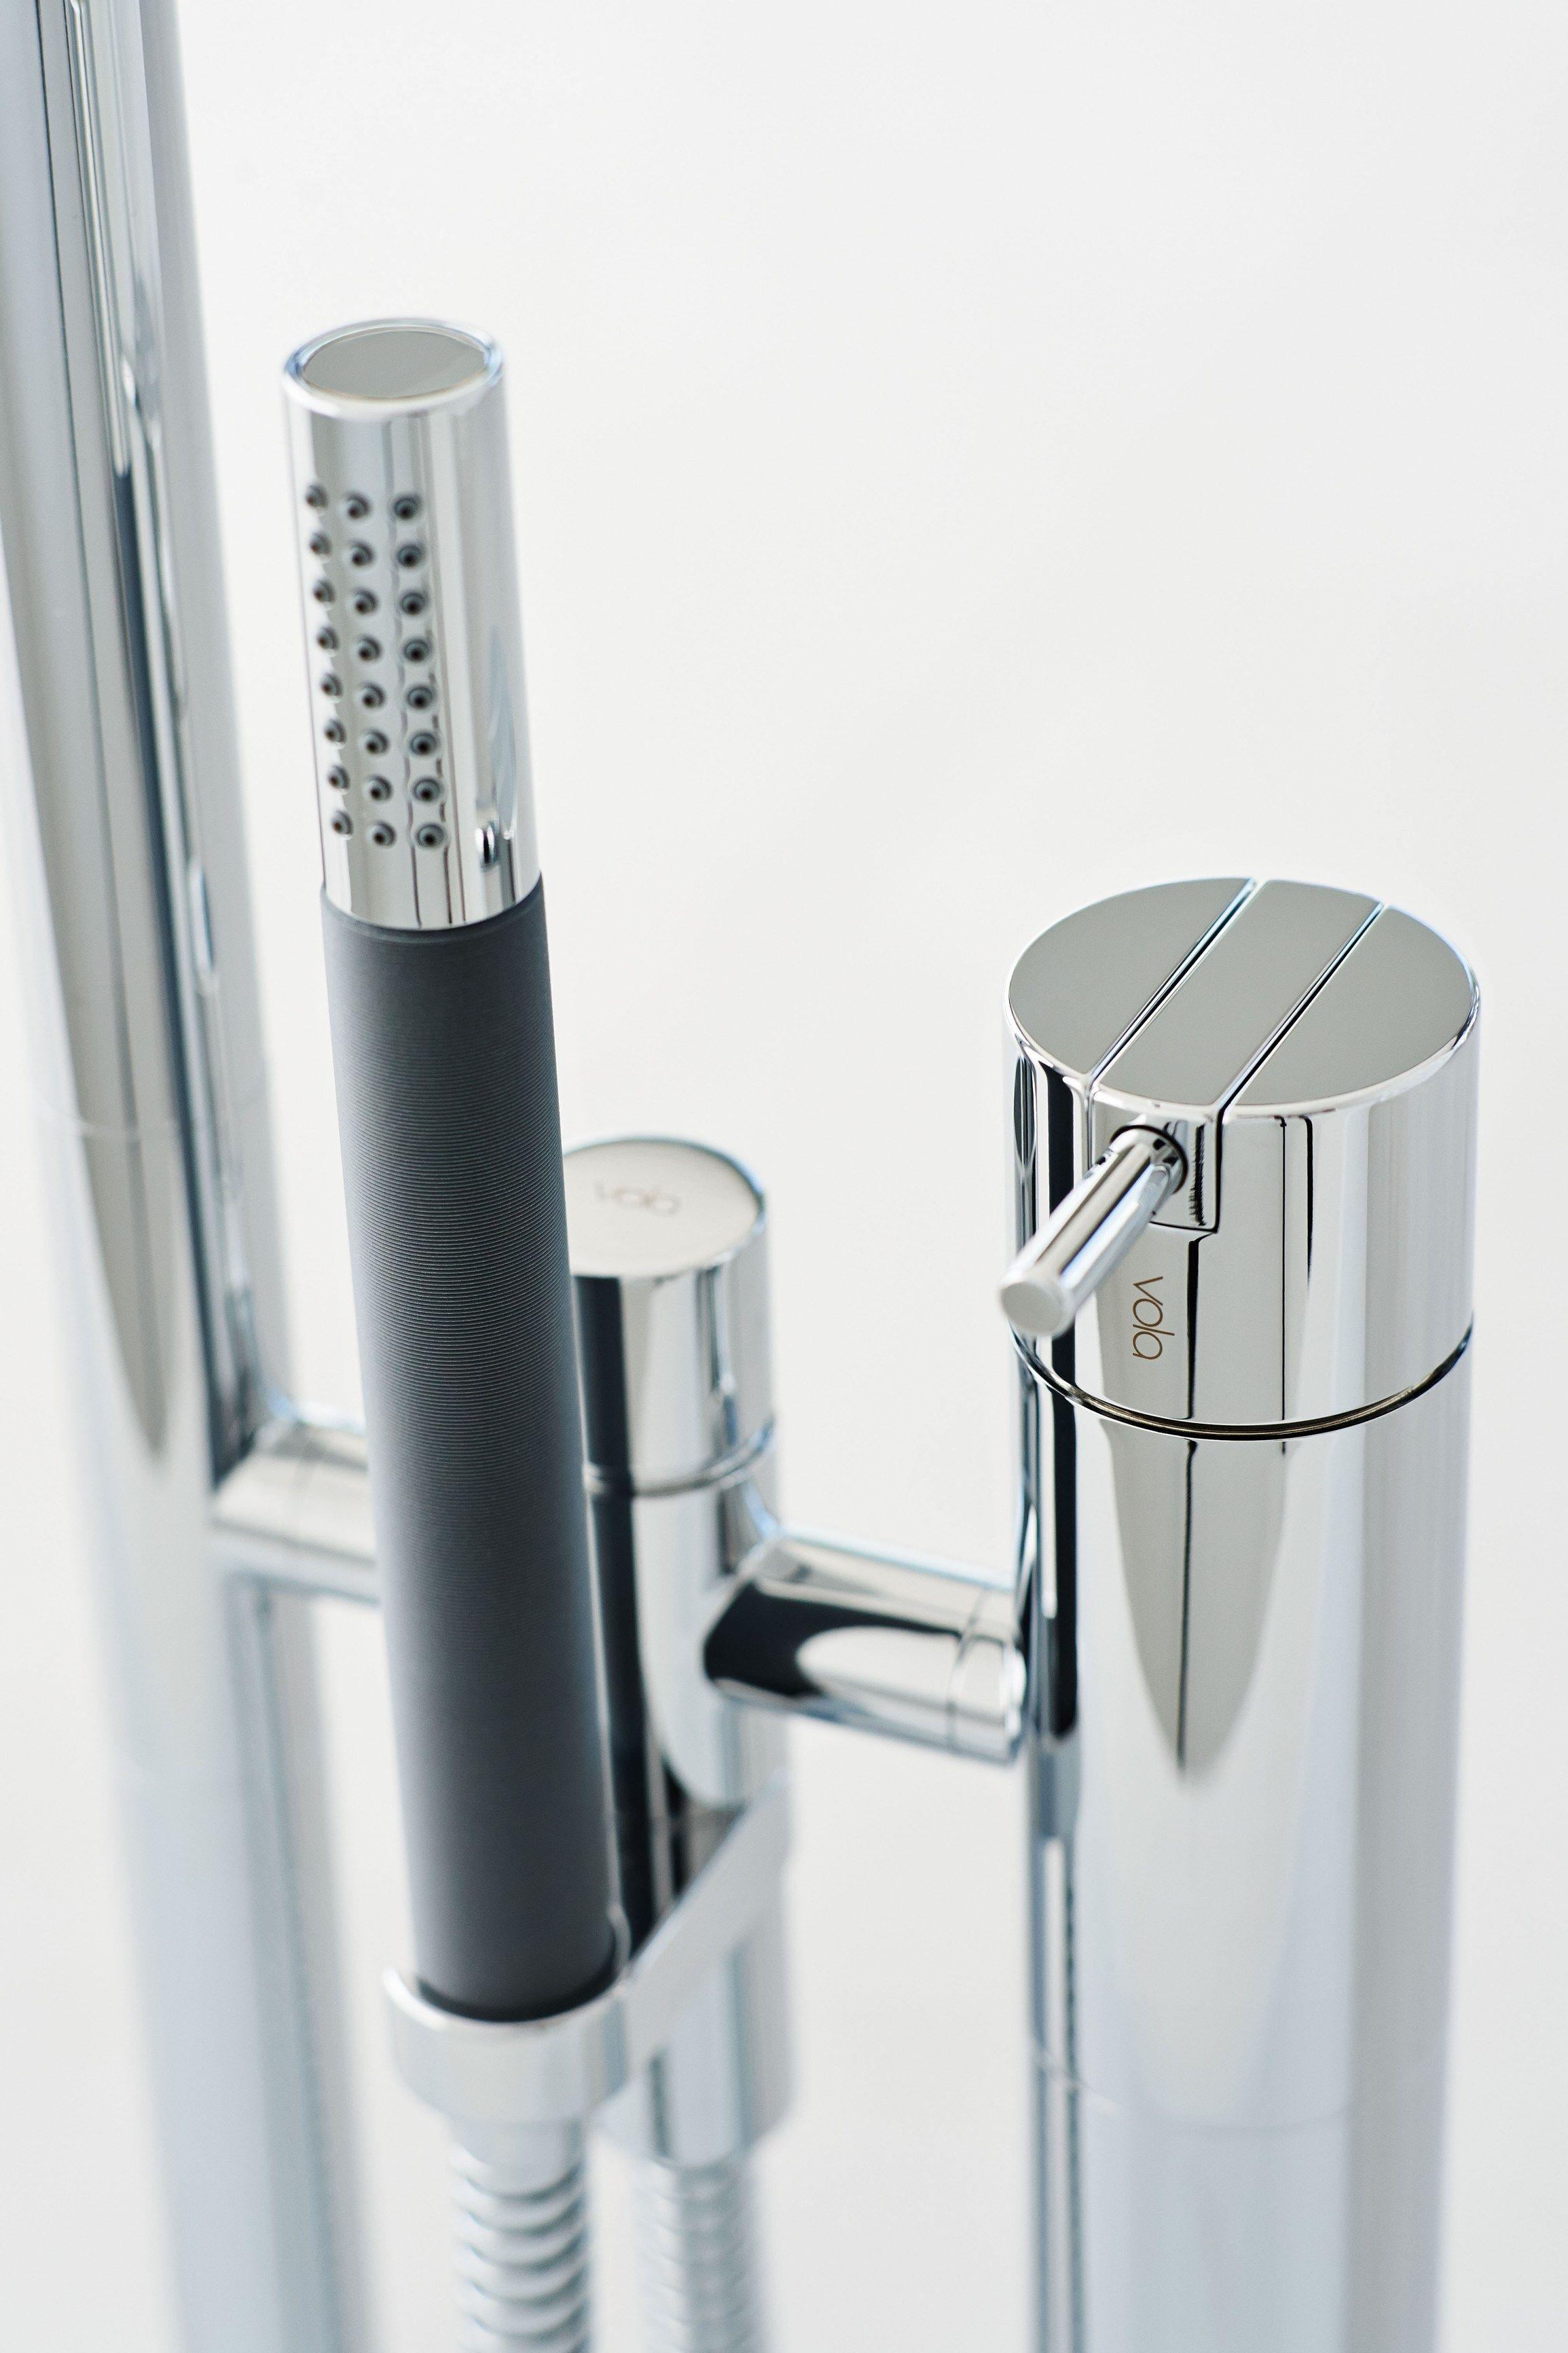 Vola: FS1 Bathtub Mixer By VOLA